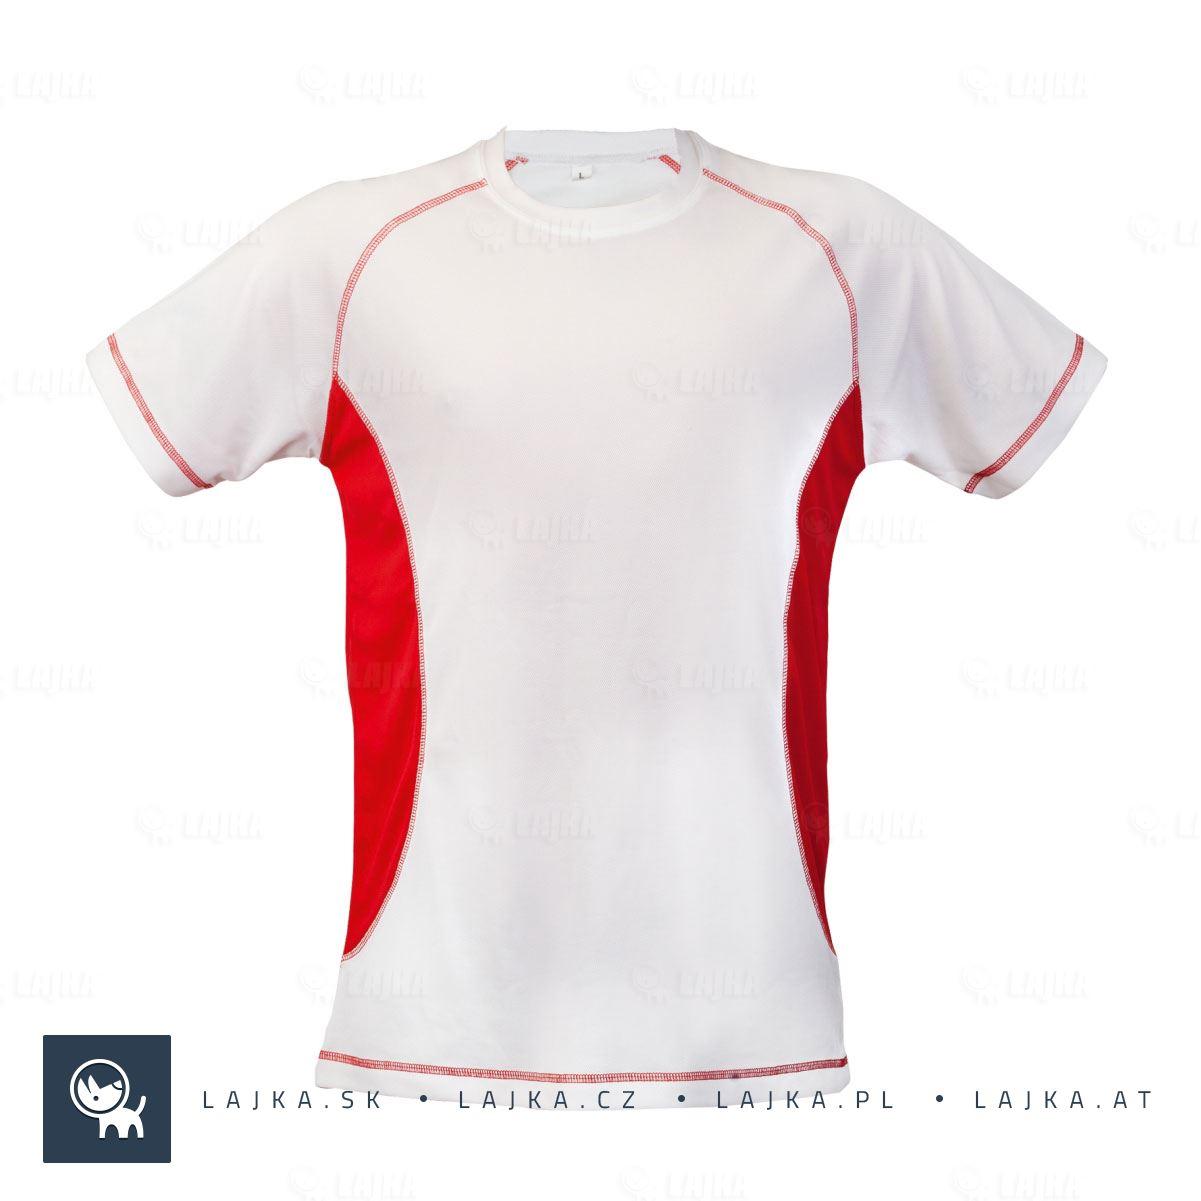 5c579c002f432 Combi športové tričko, červená   LAJKA®